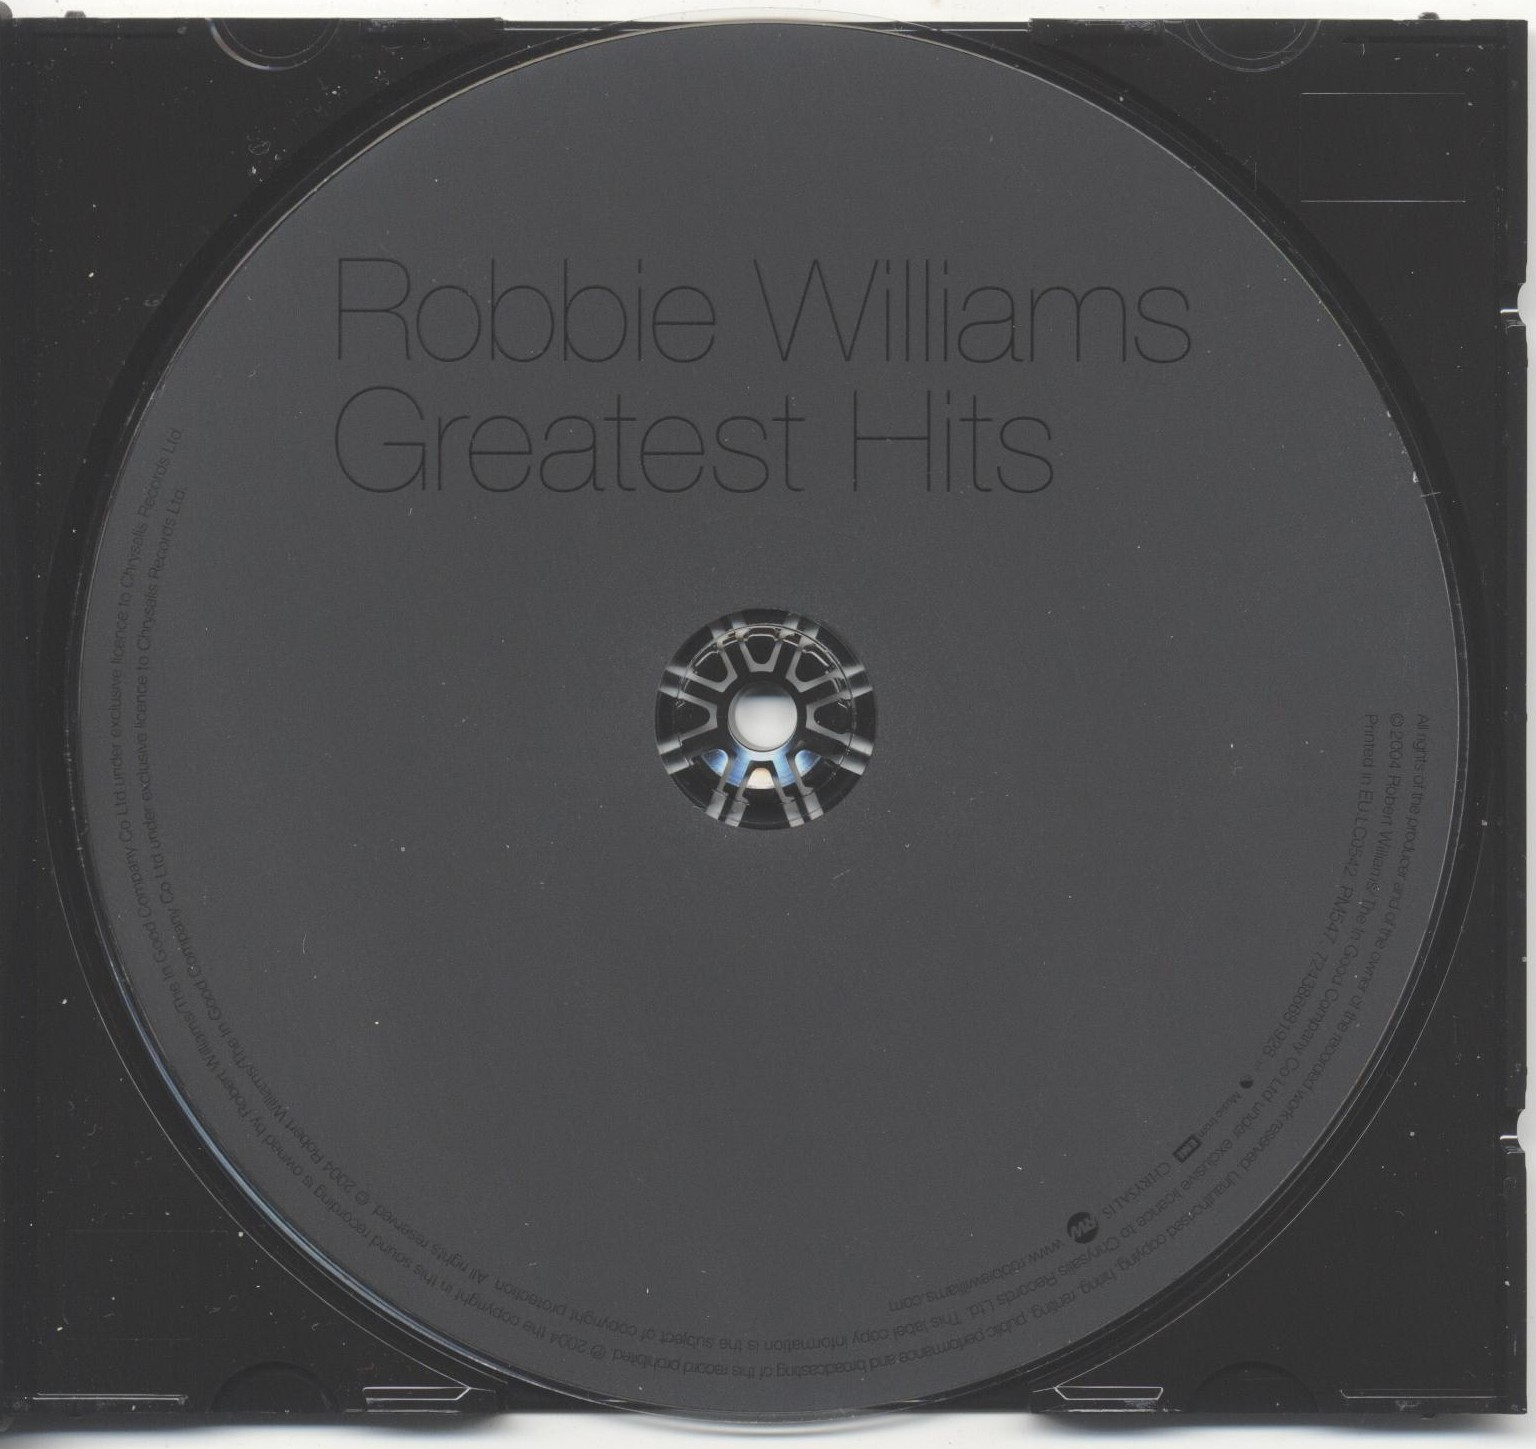 http://3.bp.blogspot.com/_z6BiIq5dOmM/TRclr44aRGI/AAAAAAAAAHA/tR5BndPr8PY/s1600/Greatest+Hits+-+Robbie+Williams+%2528Disc%2529+%255B2004%255D.jpg